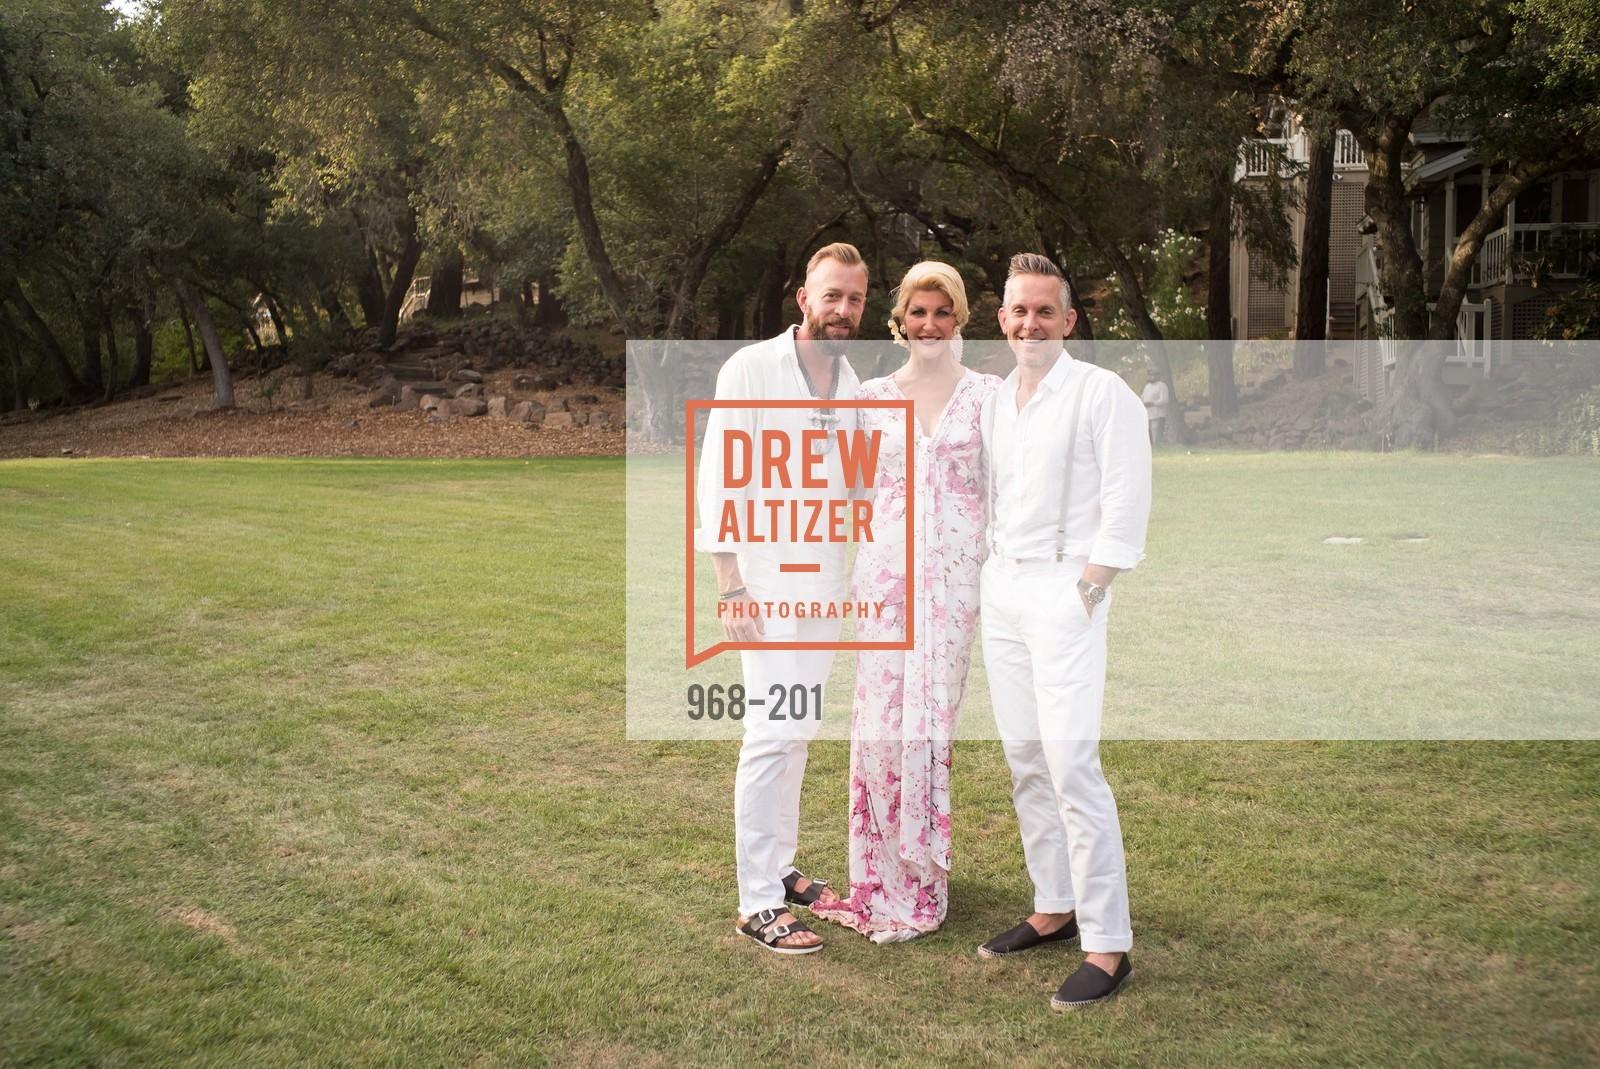 Michael Purdy, Karen Caldwell, Jay Jeffers, Photo #968-201